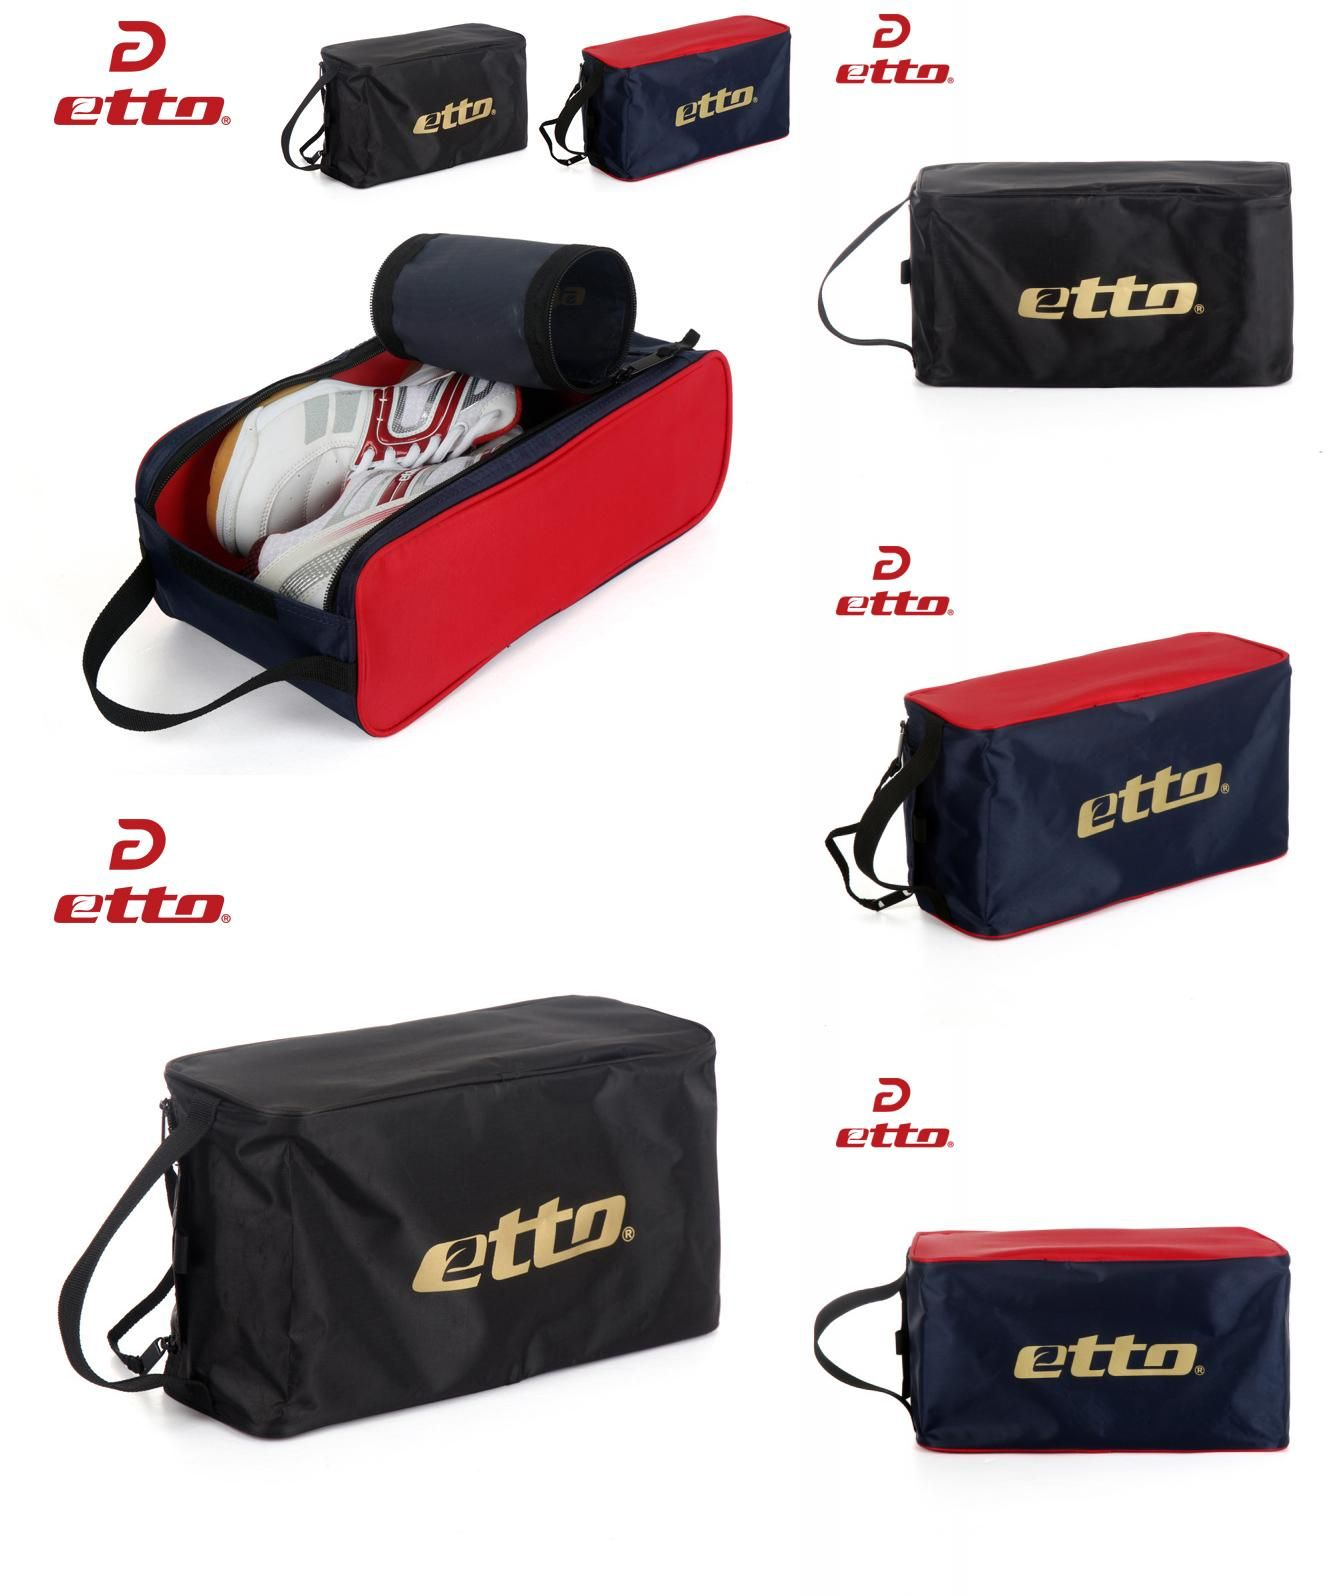 a5e4e6ce3b44  Visit to Buy  Etto New Folding Soccer Sport Shoes Storage Bags Men Women  Mulitifunctional